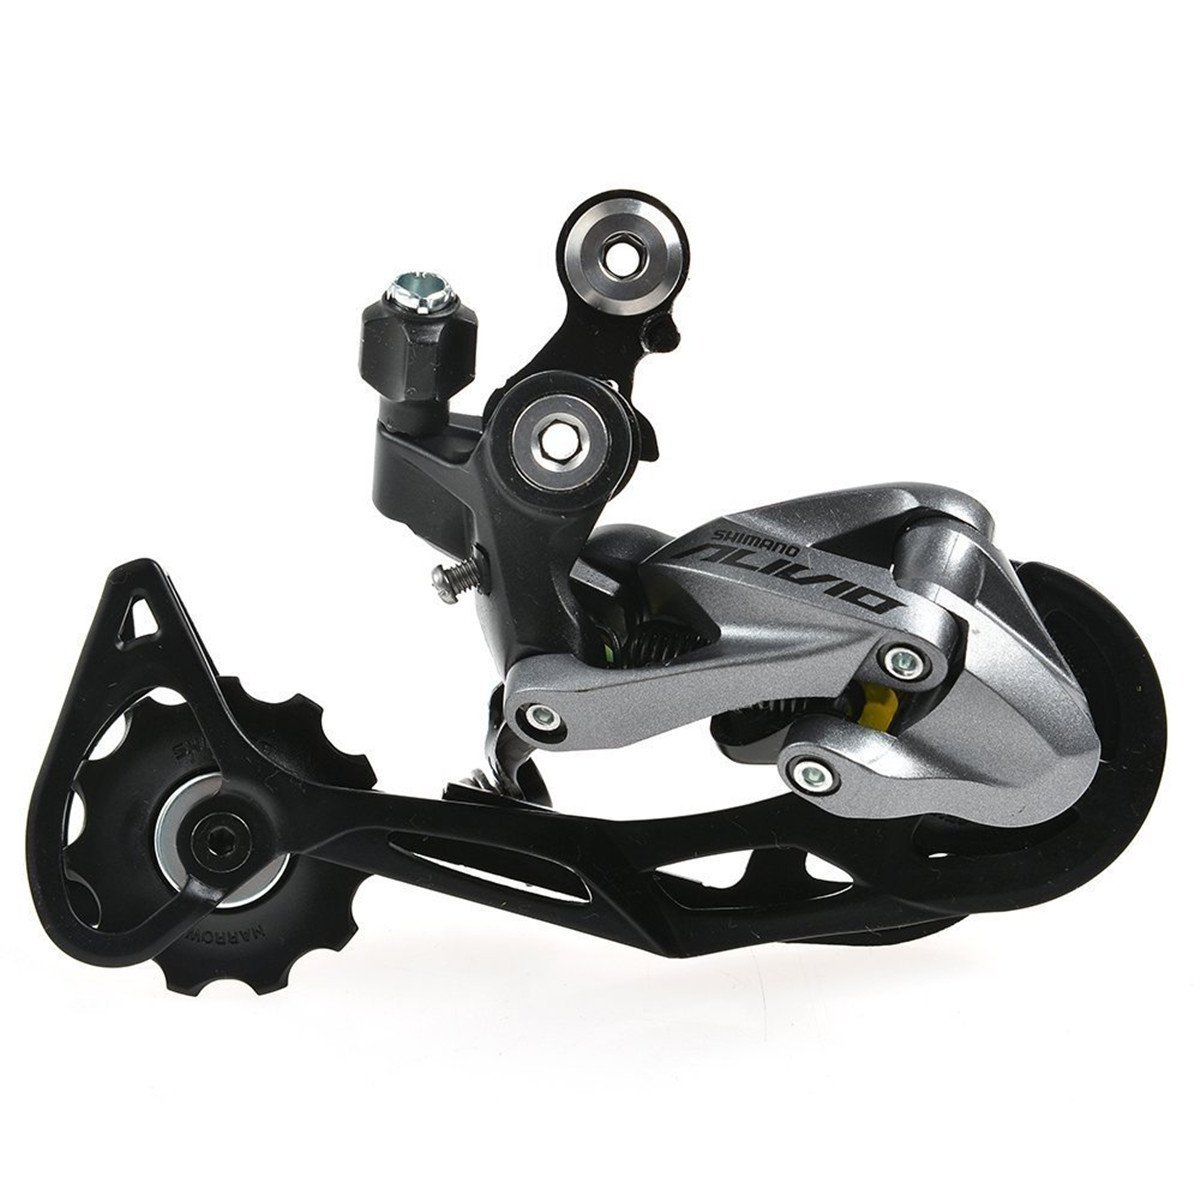 Shimano Alivio RD//M430 9-Speed Bicycle Rear Bike Derailleur Pulley Set